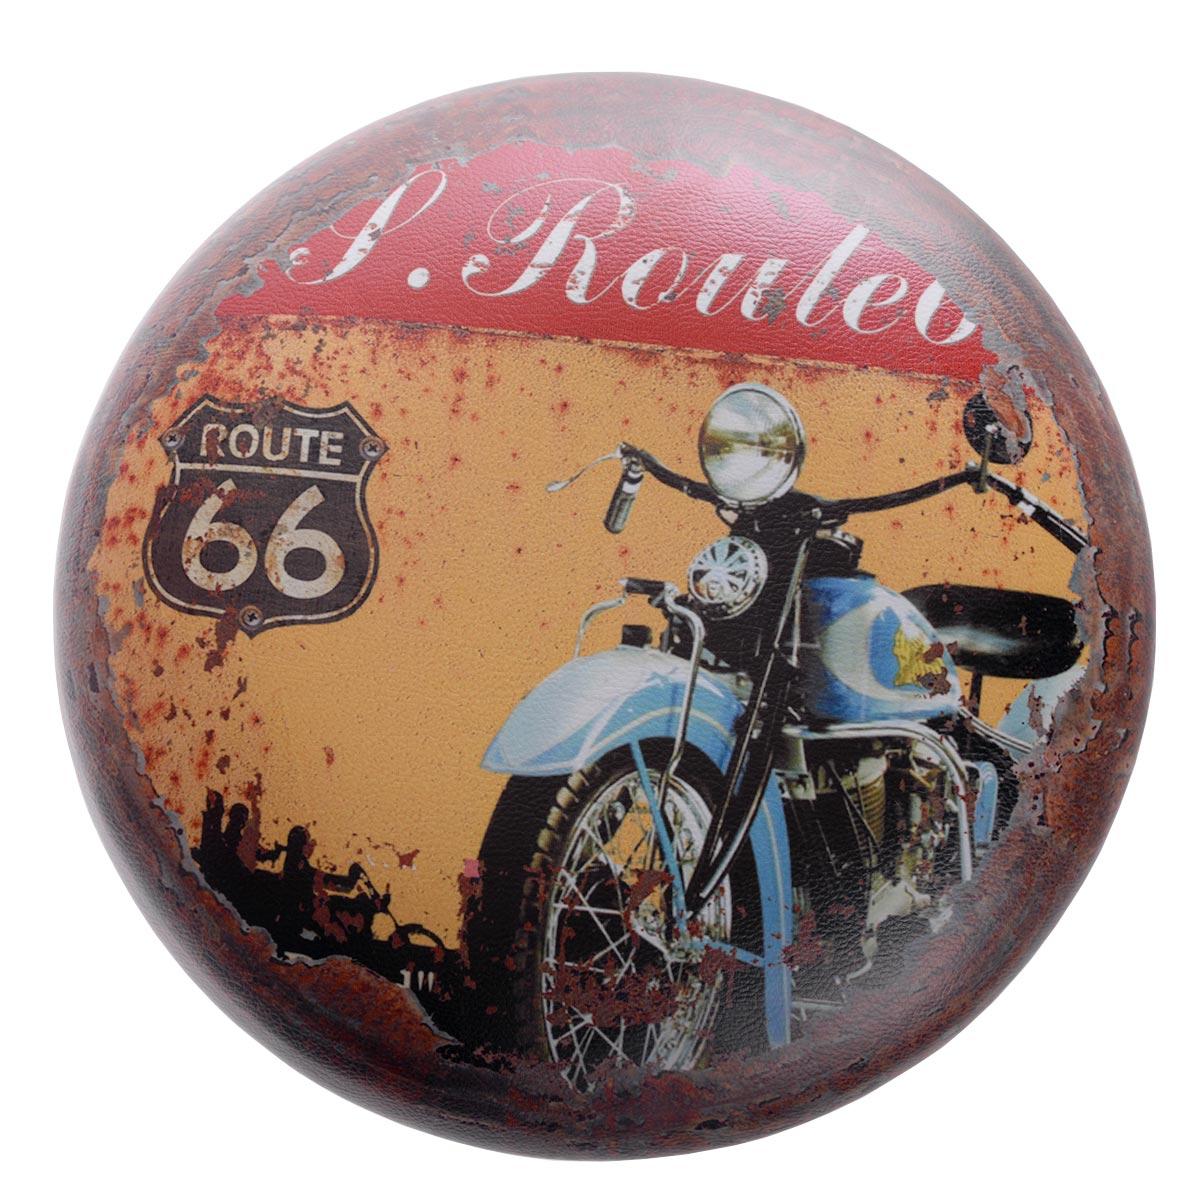 "Vintage διακοσμητικά σκαμπώ με χώρο αποθήκευσης ""Route 66"" - σετ 3 τεμαχίων - OEM 52353"